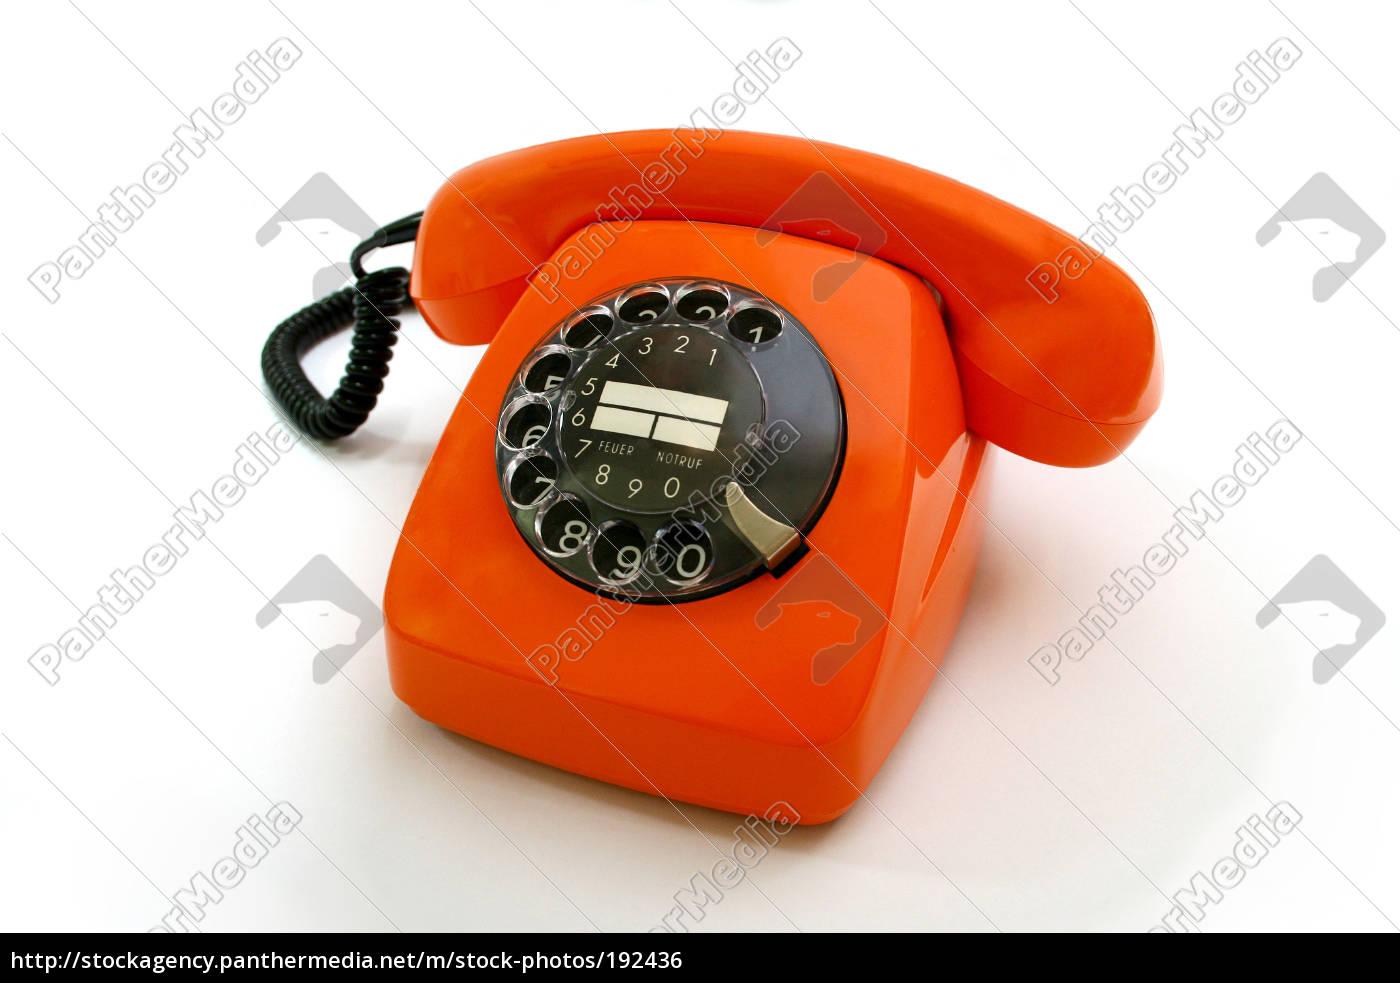 the, phone, 3 - 192436